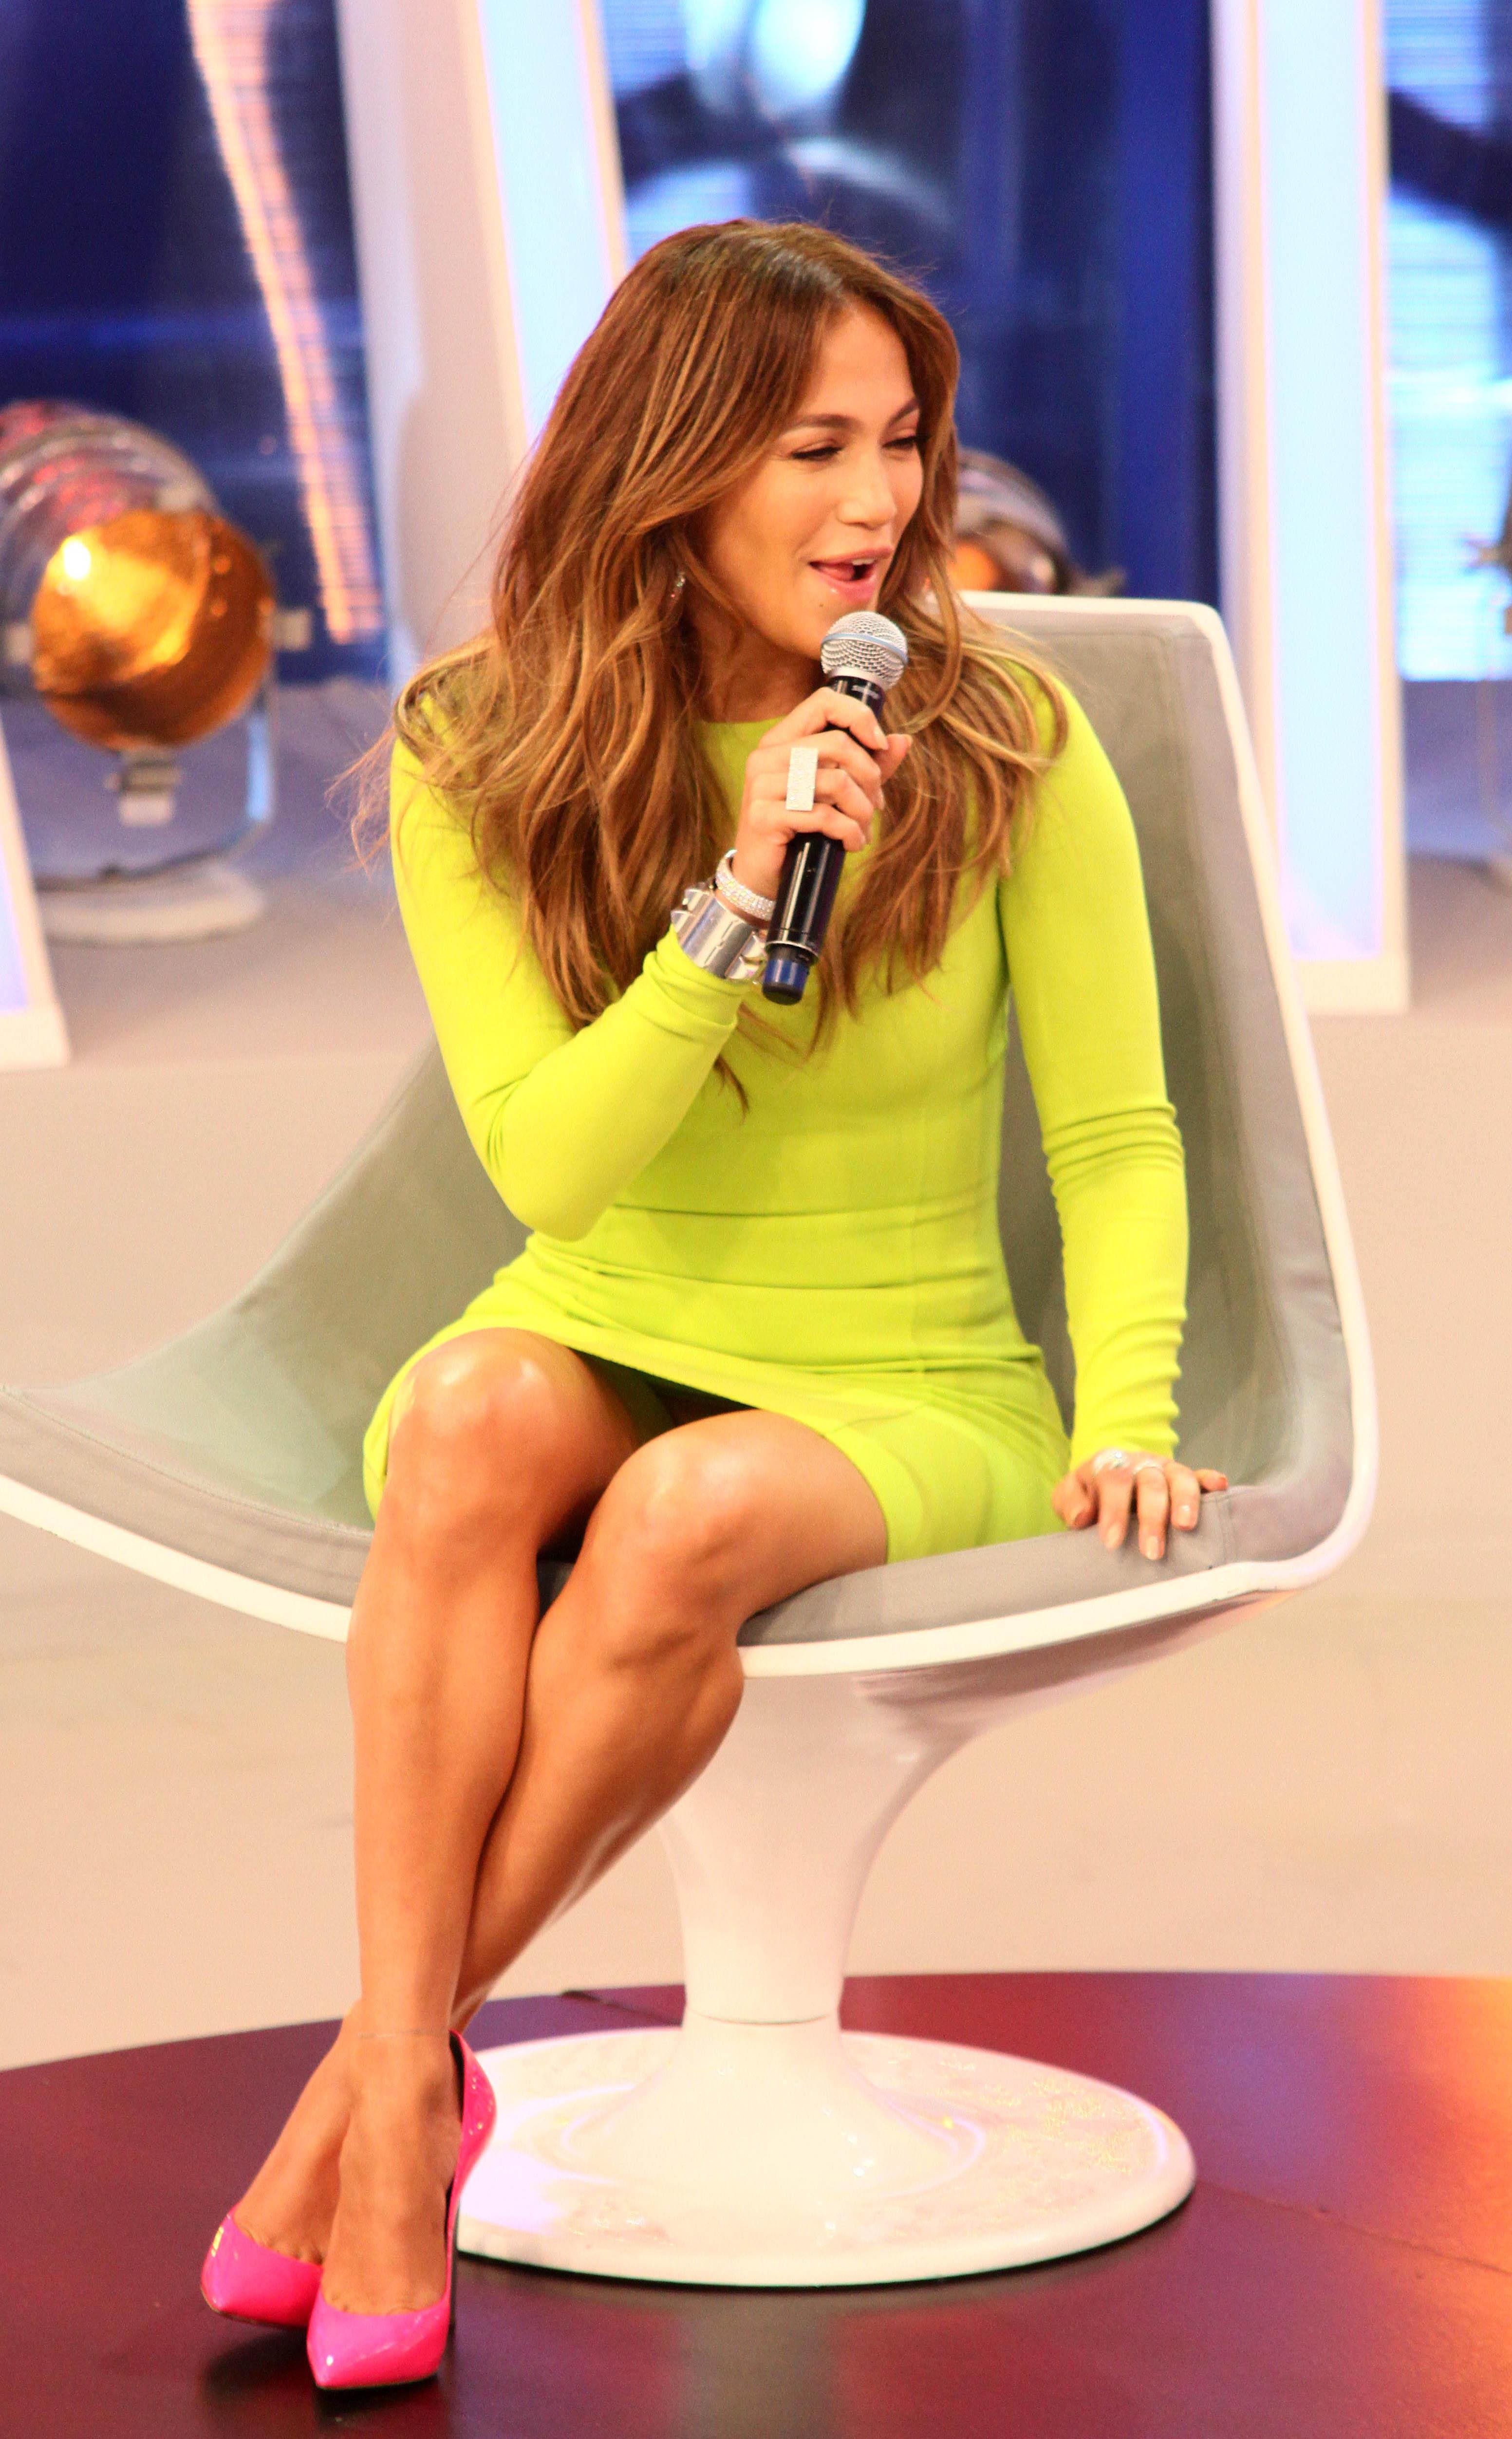 84286_Jennifer_Lopez_Melhor_do_Brasil_in_Brazil_March_26_2012_10_0_123_61lo.jpg